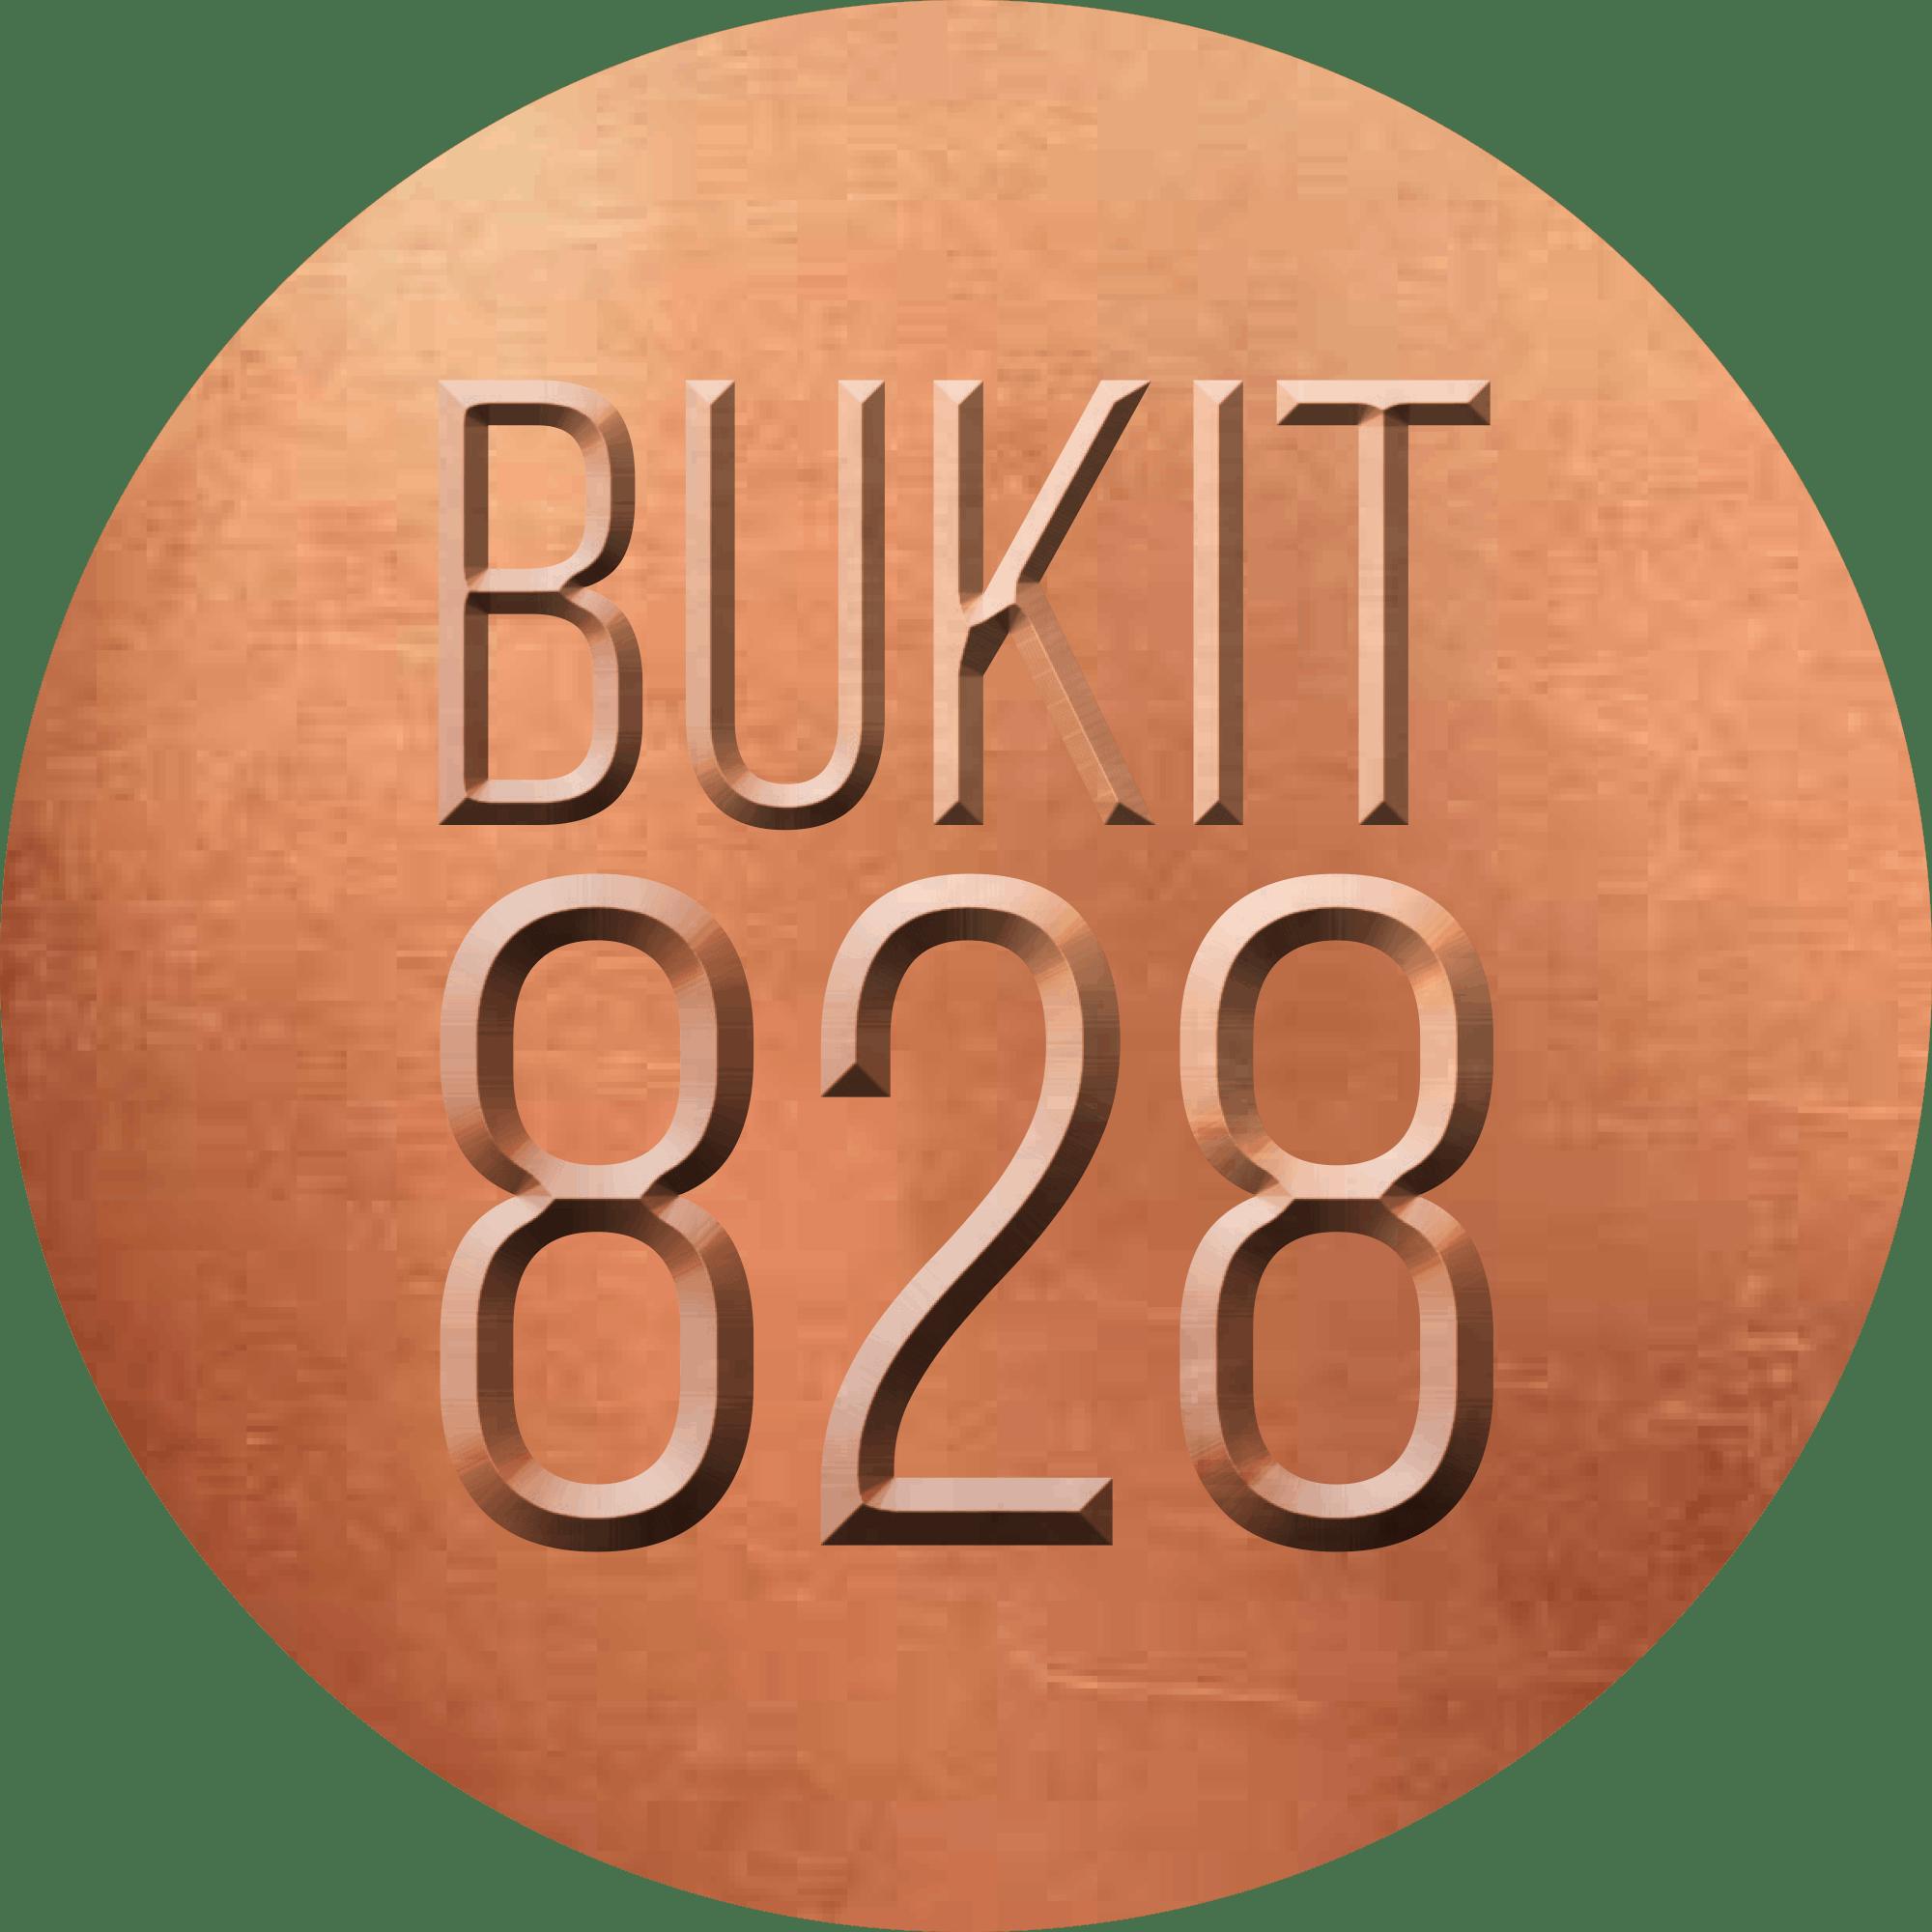 Bukit 828 logo